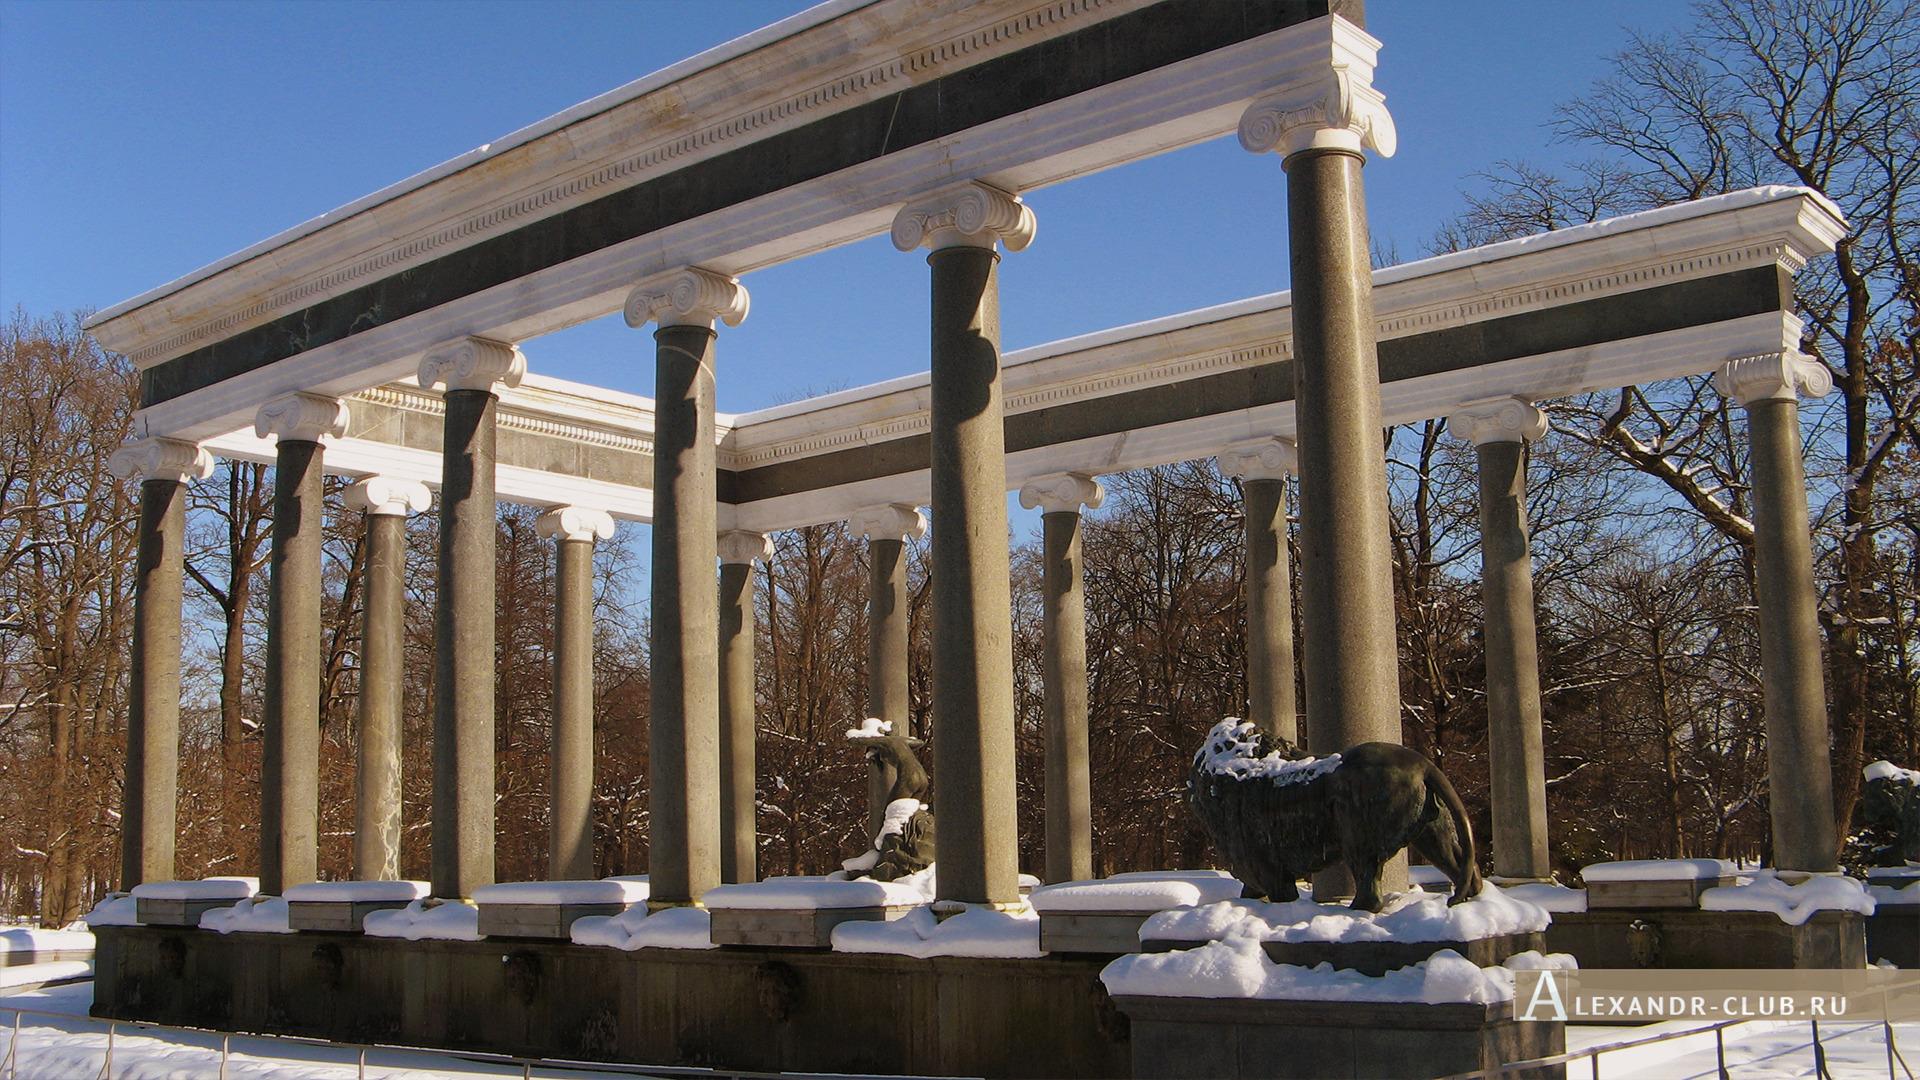 Петергоф, зима, Нижний парк, фонтан «Львиный каскад» – 2